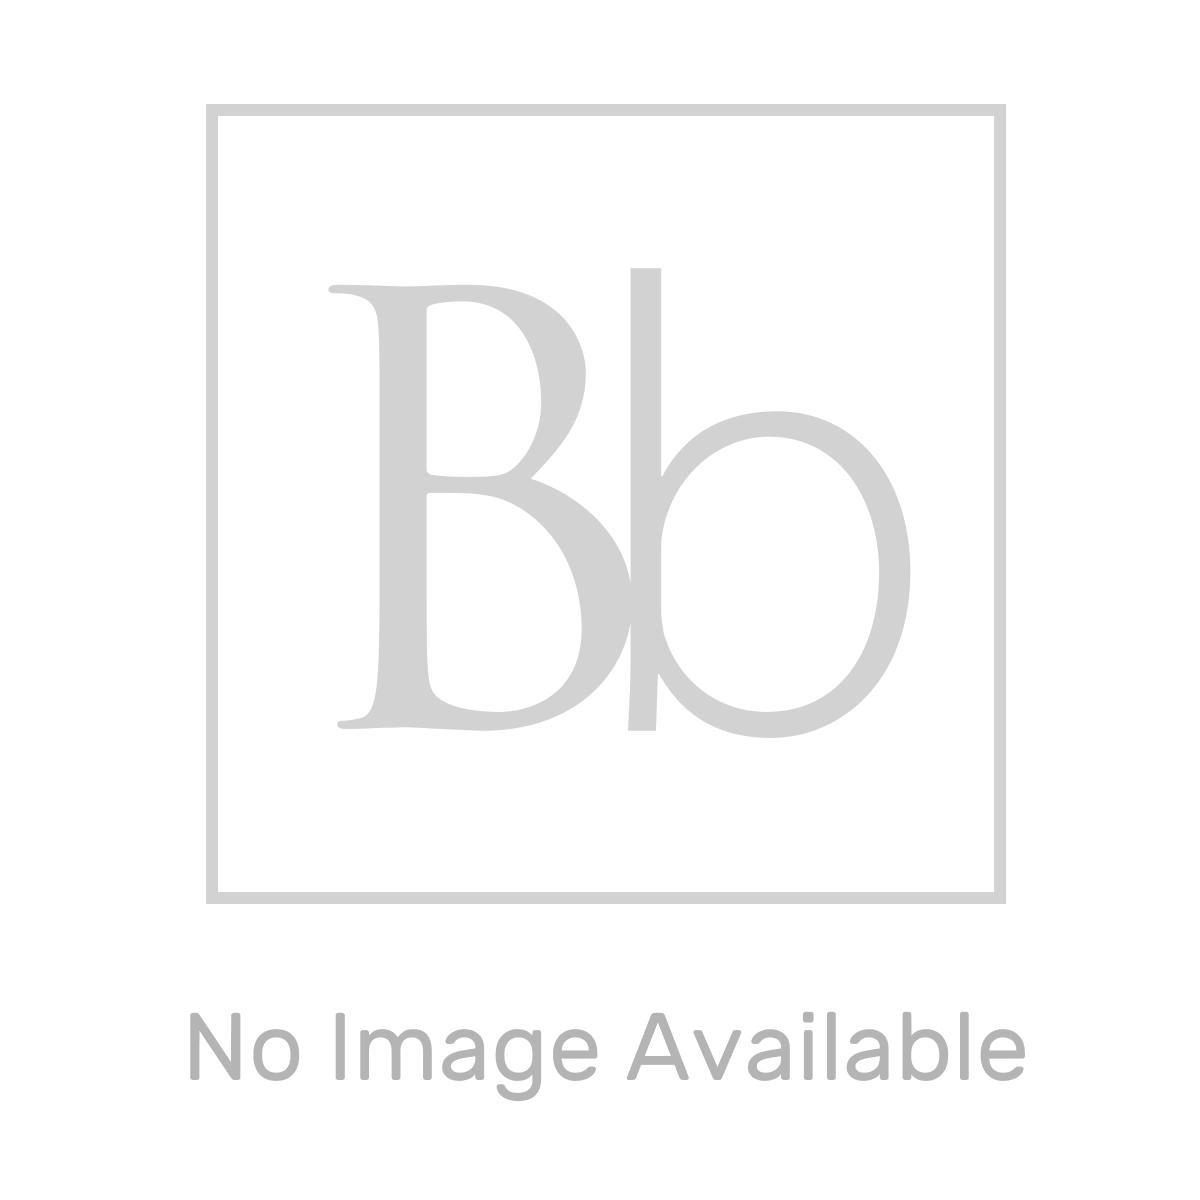 Aquadart Rectangular 1600 x 700 Shower Tray